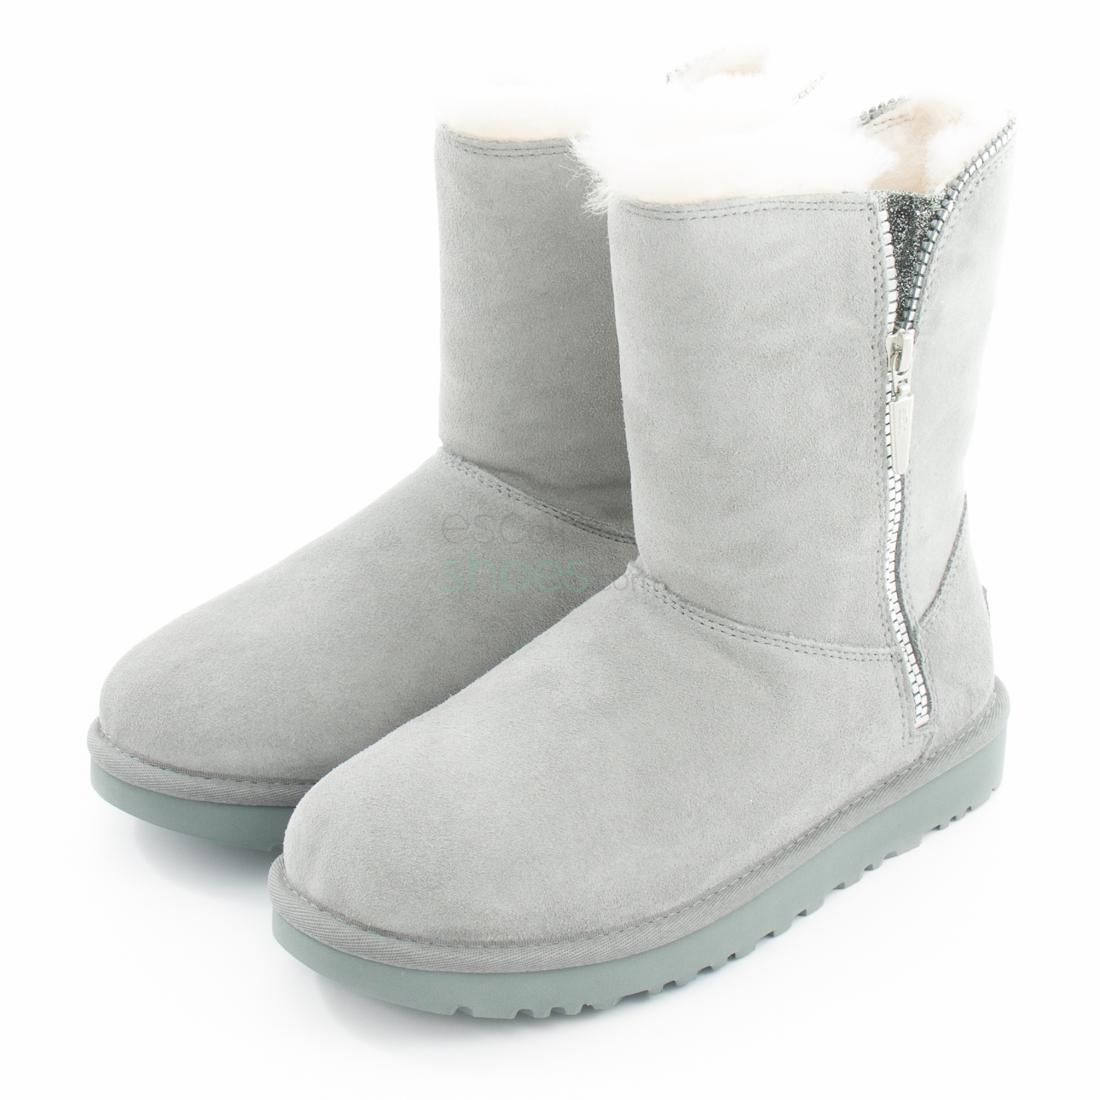 c63dd294930 Boots UGG Australia Marice Geyser 1019633